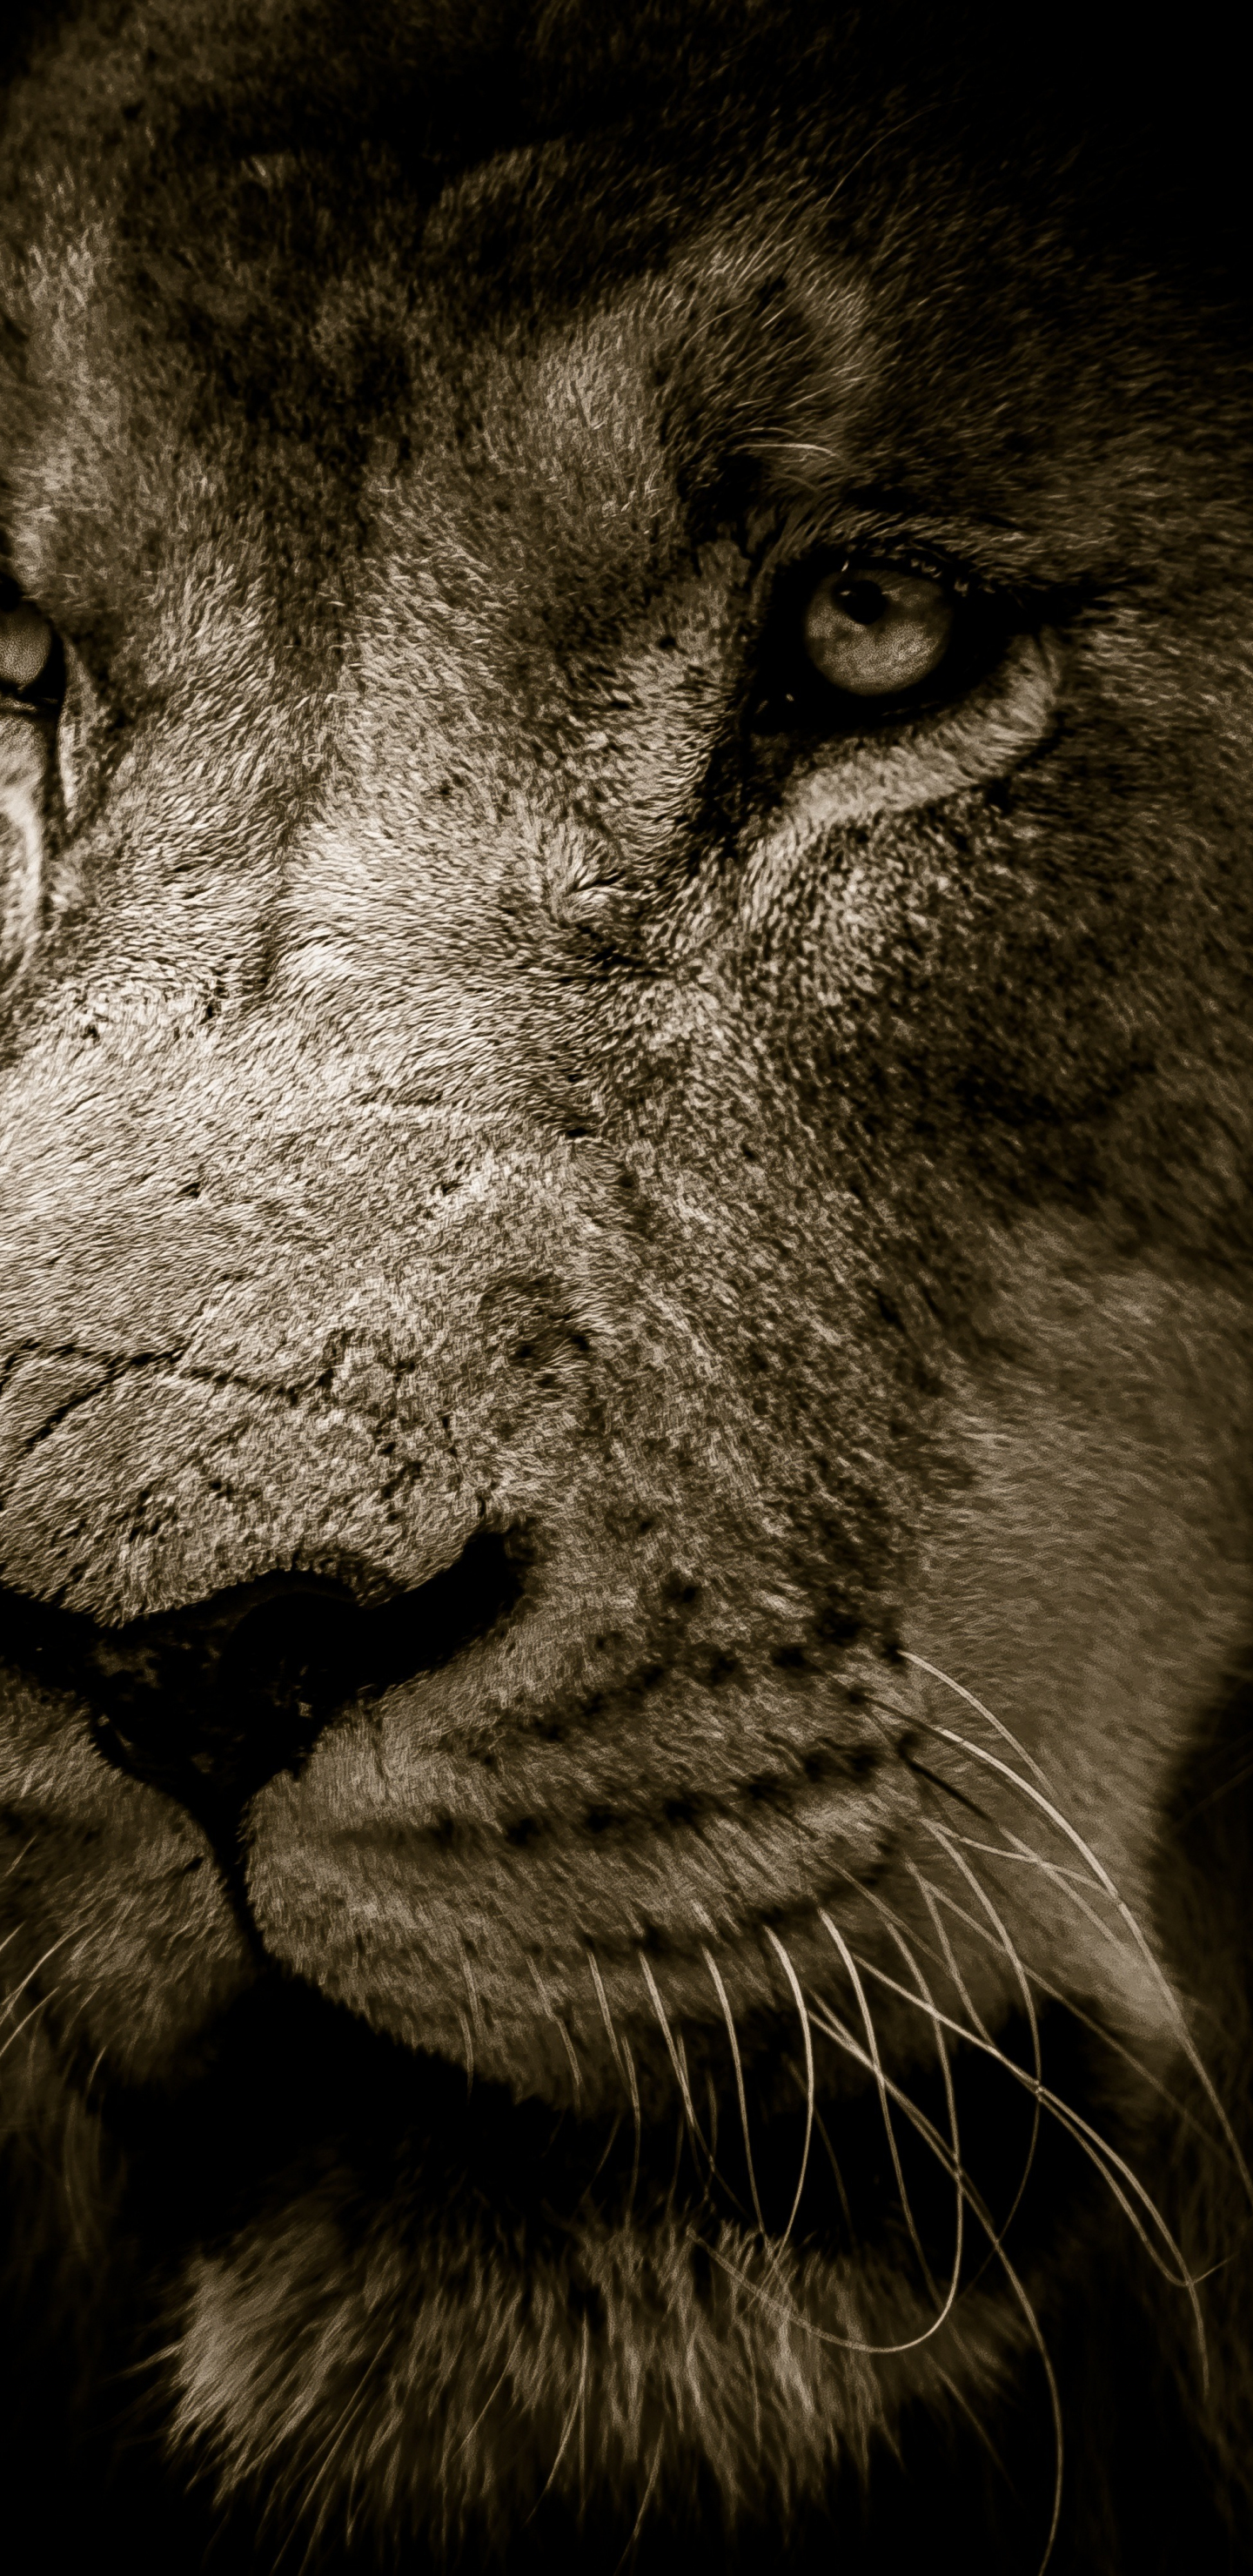 Download 1440x2960 Wallpaper Lion Fur Muzzle Predator Samsung